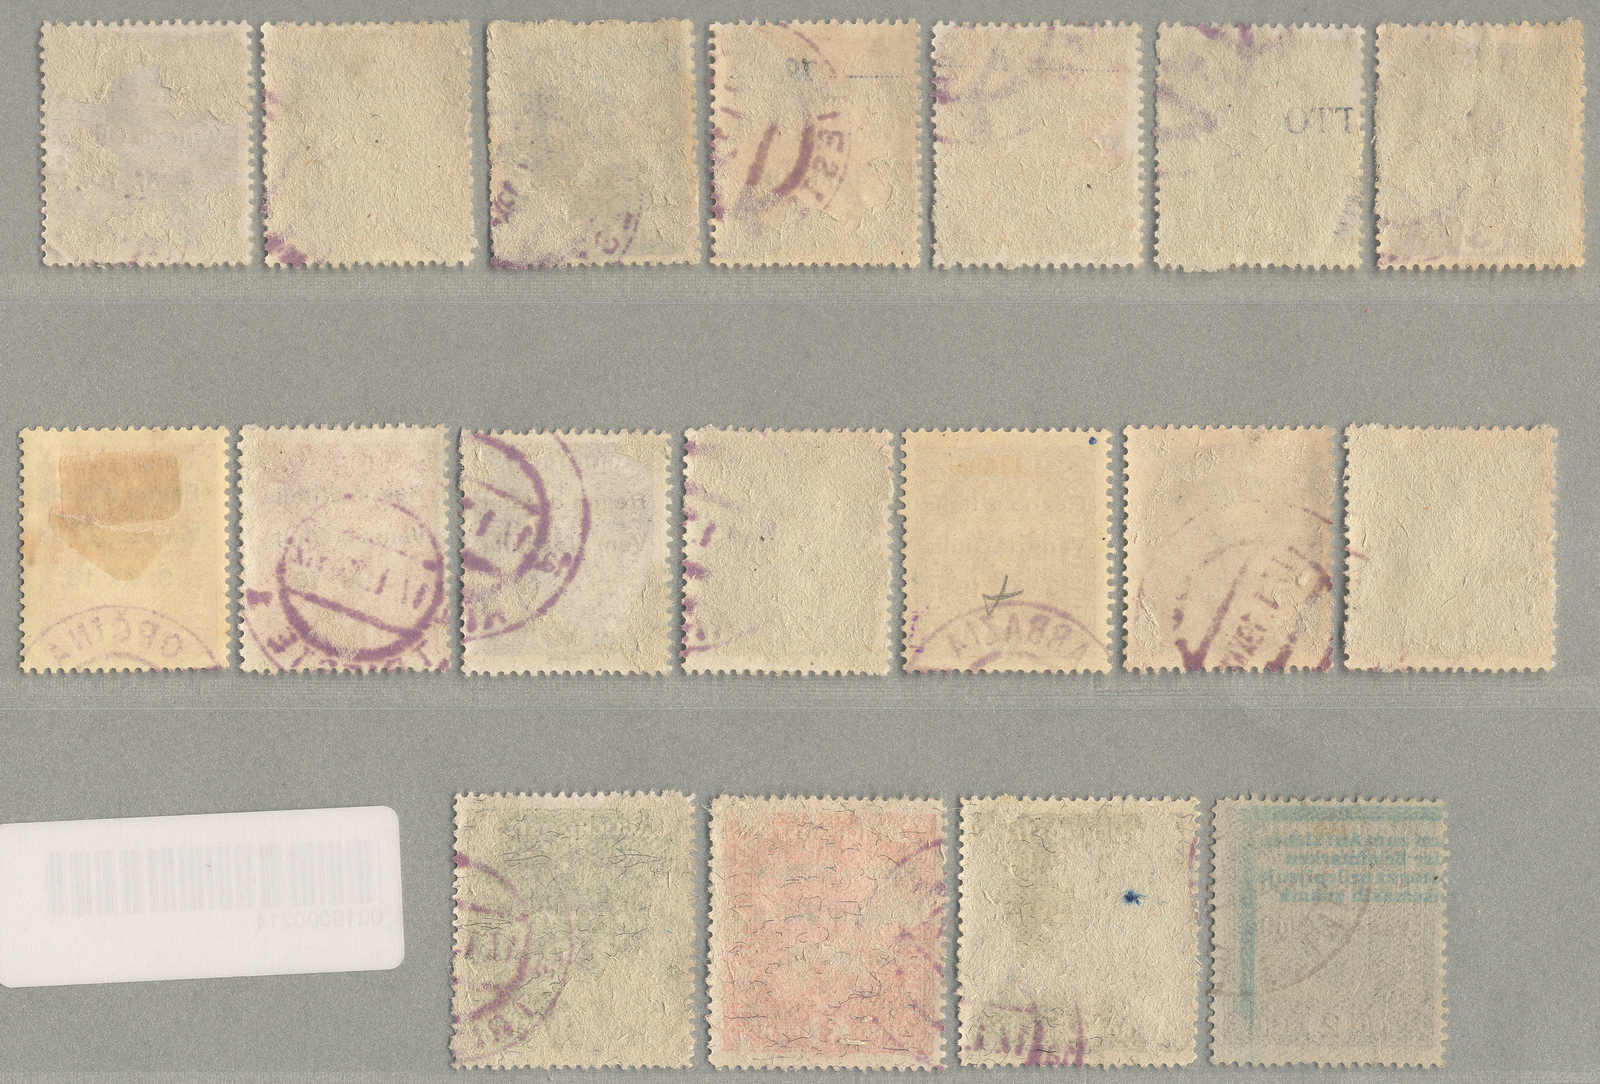 Lot 10941 - europa italien besetzung i. wk julisch venetien -  classicphil GmbH 7'th classicphil Auction - Day 1